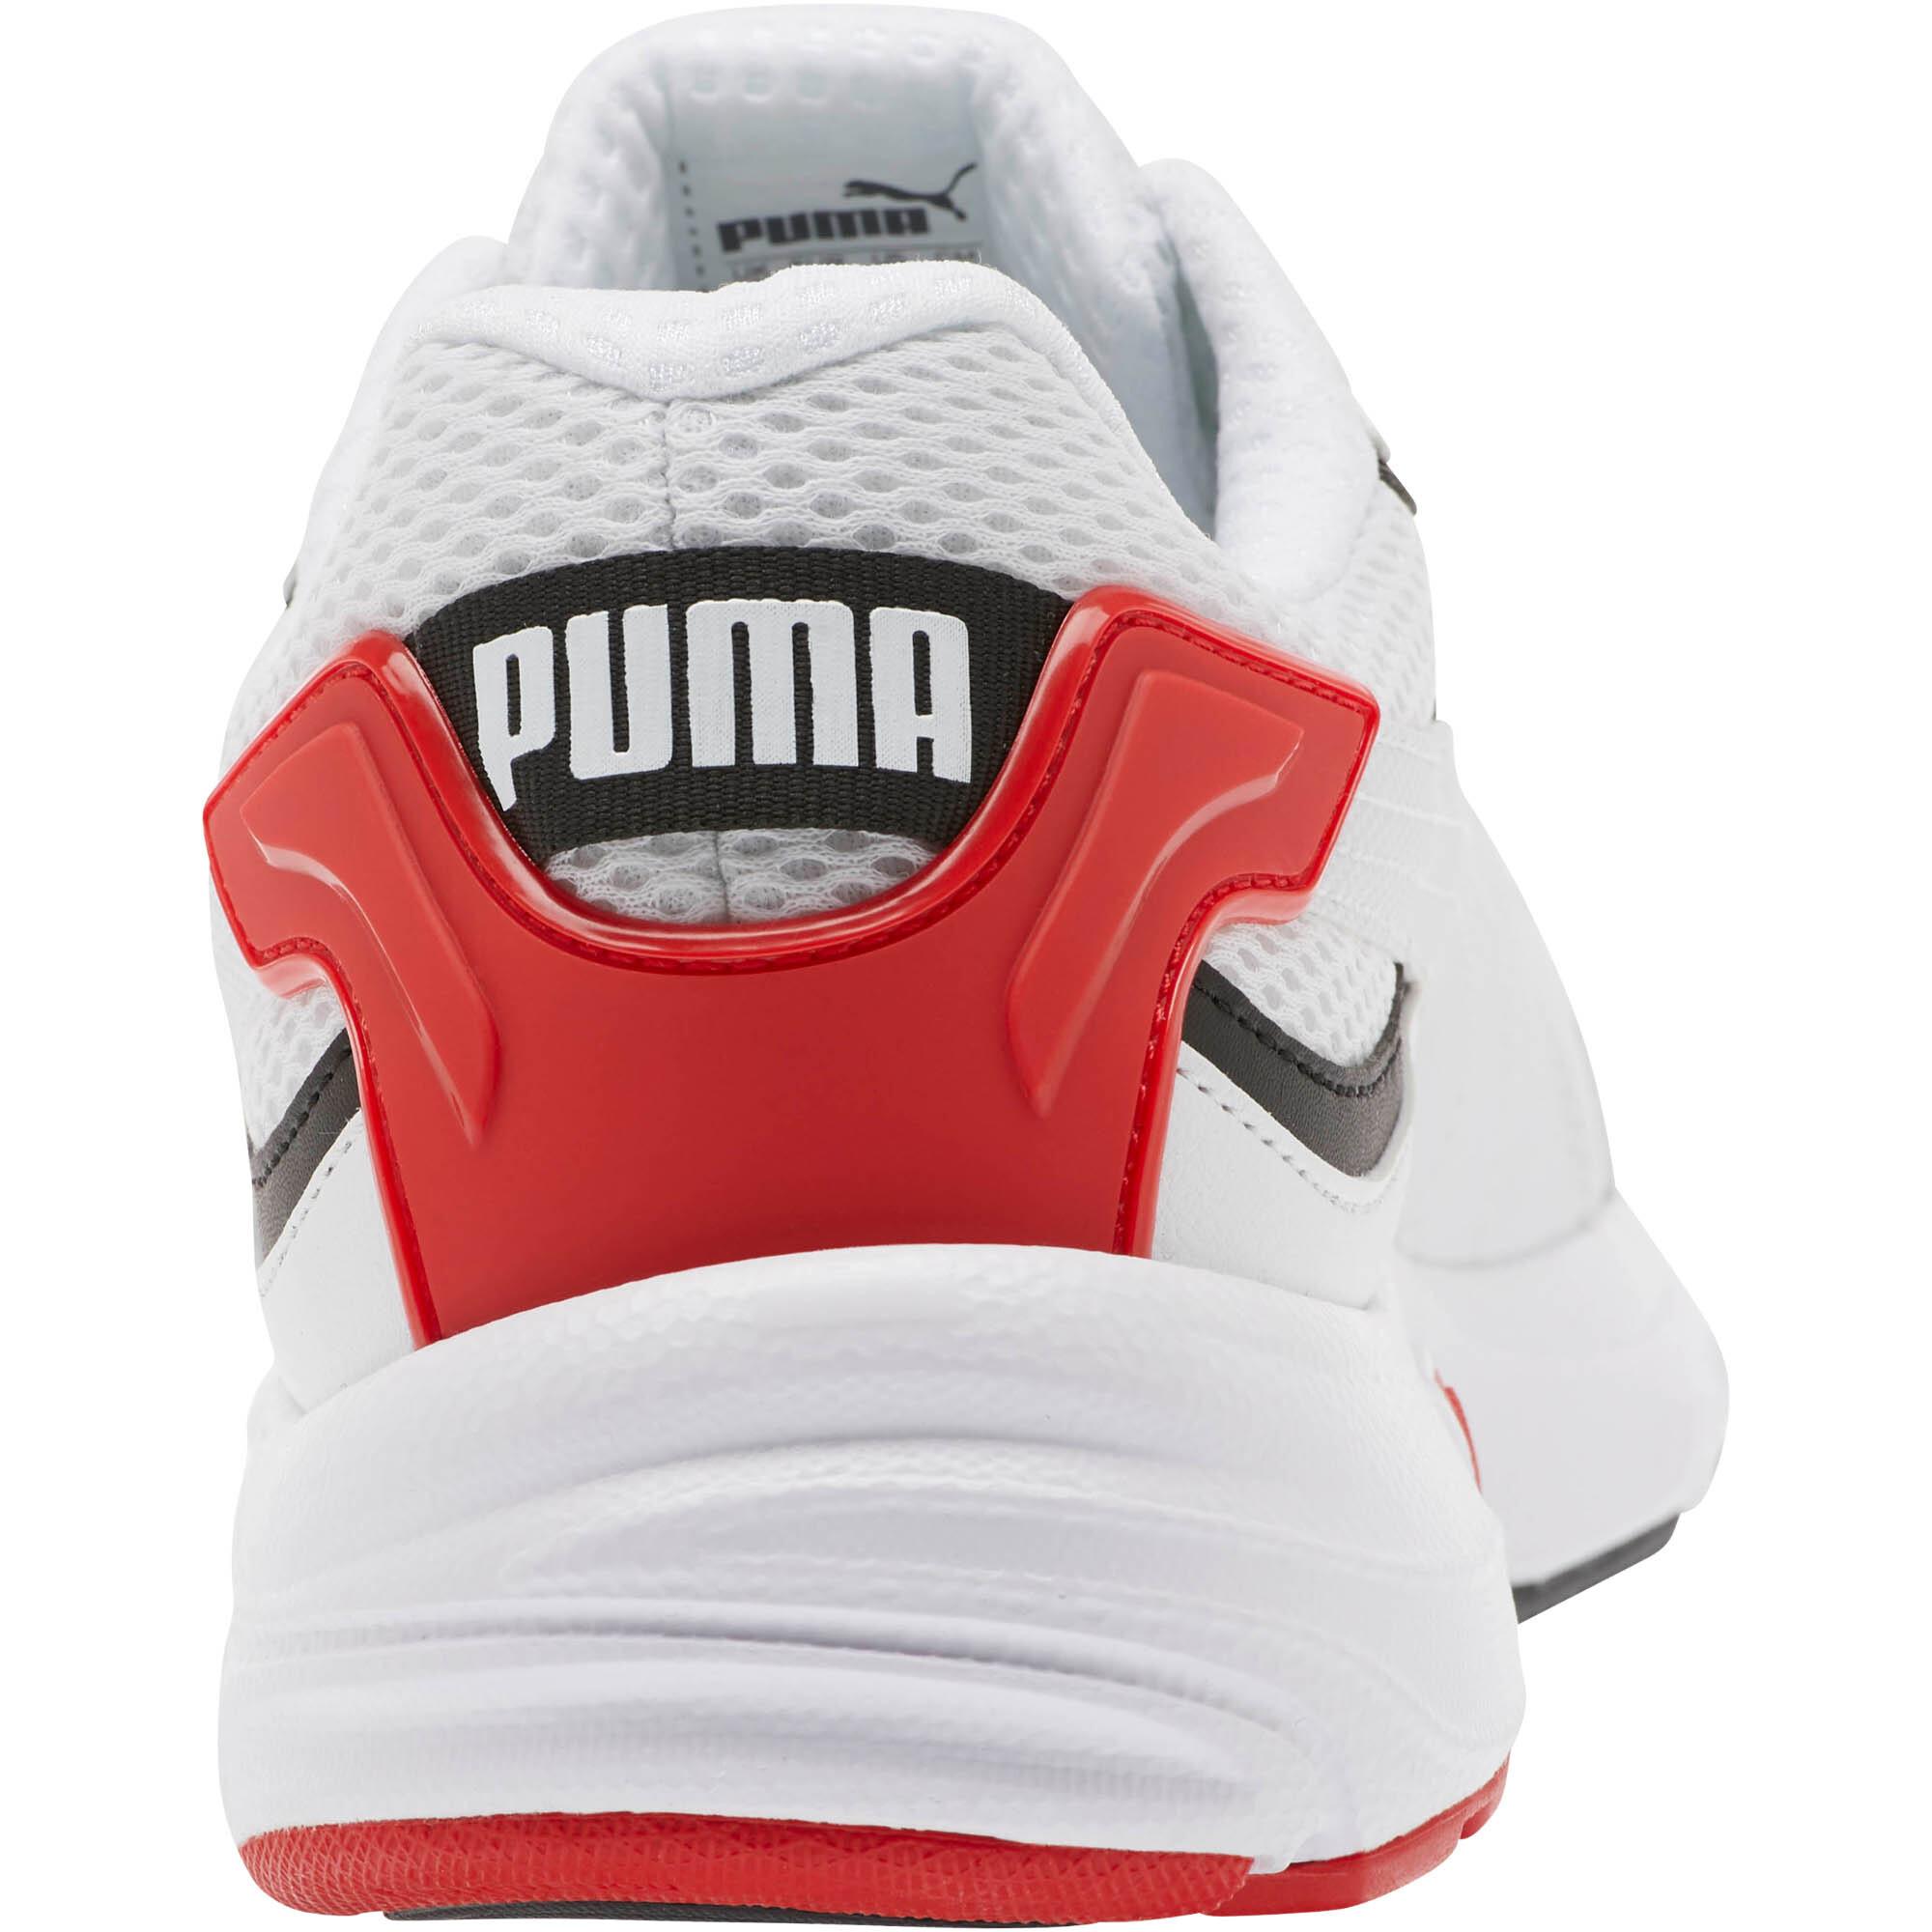 PUMA-Axis-Plus-90s-Sneakers-Men-Shoe-Basics thumbnail 11